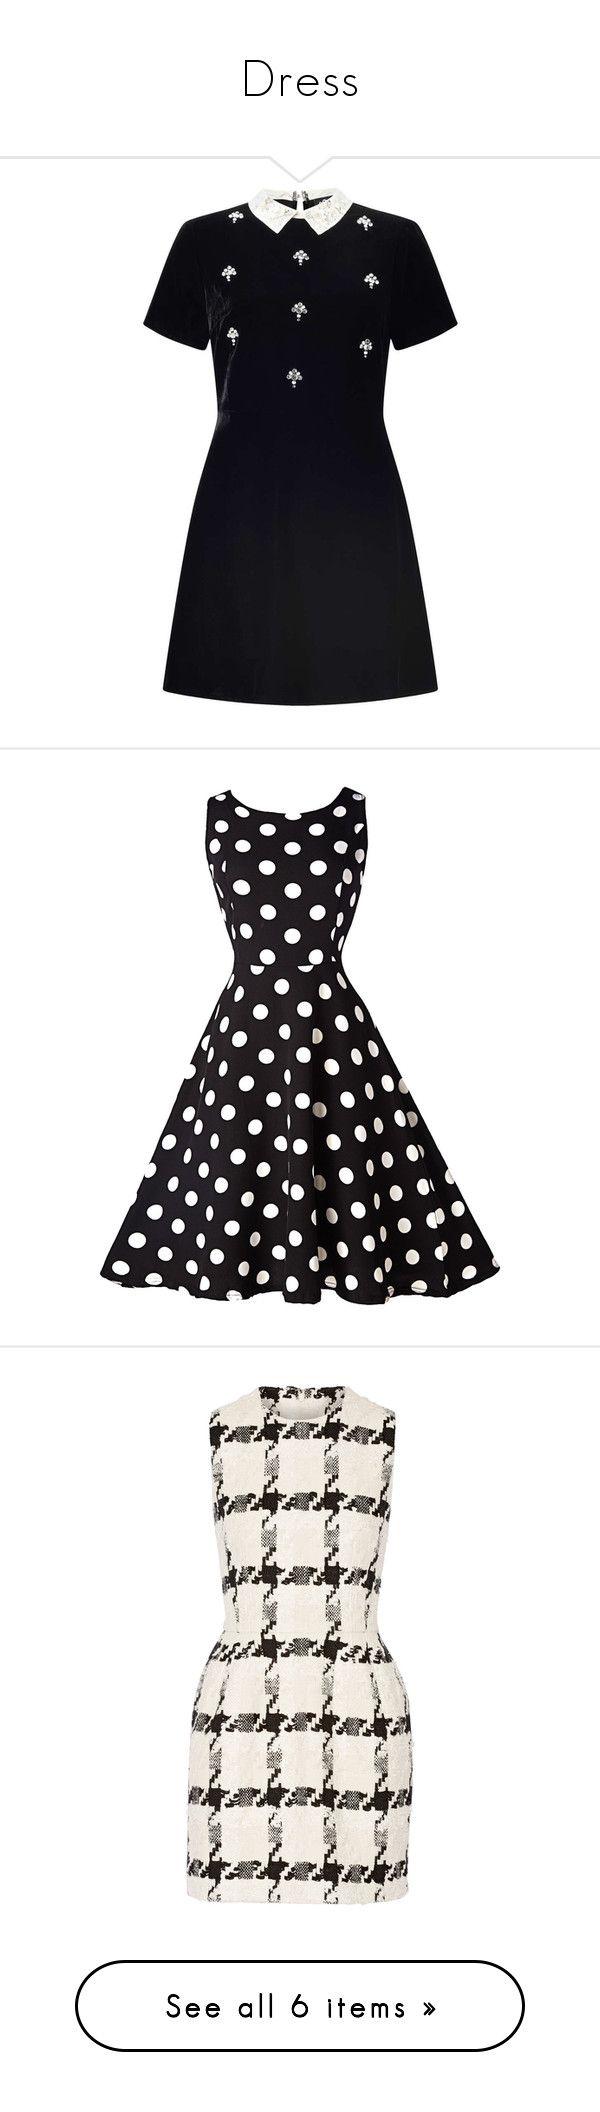 """Dress"" by venus-galaxy ❤ liked on Polyvore featuring dresses, vestidos, black, petite, petite skater dress, velvet dress, skater dress, miss selfridge dress, petite dresses and polka dot swing dress"